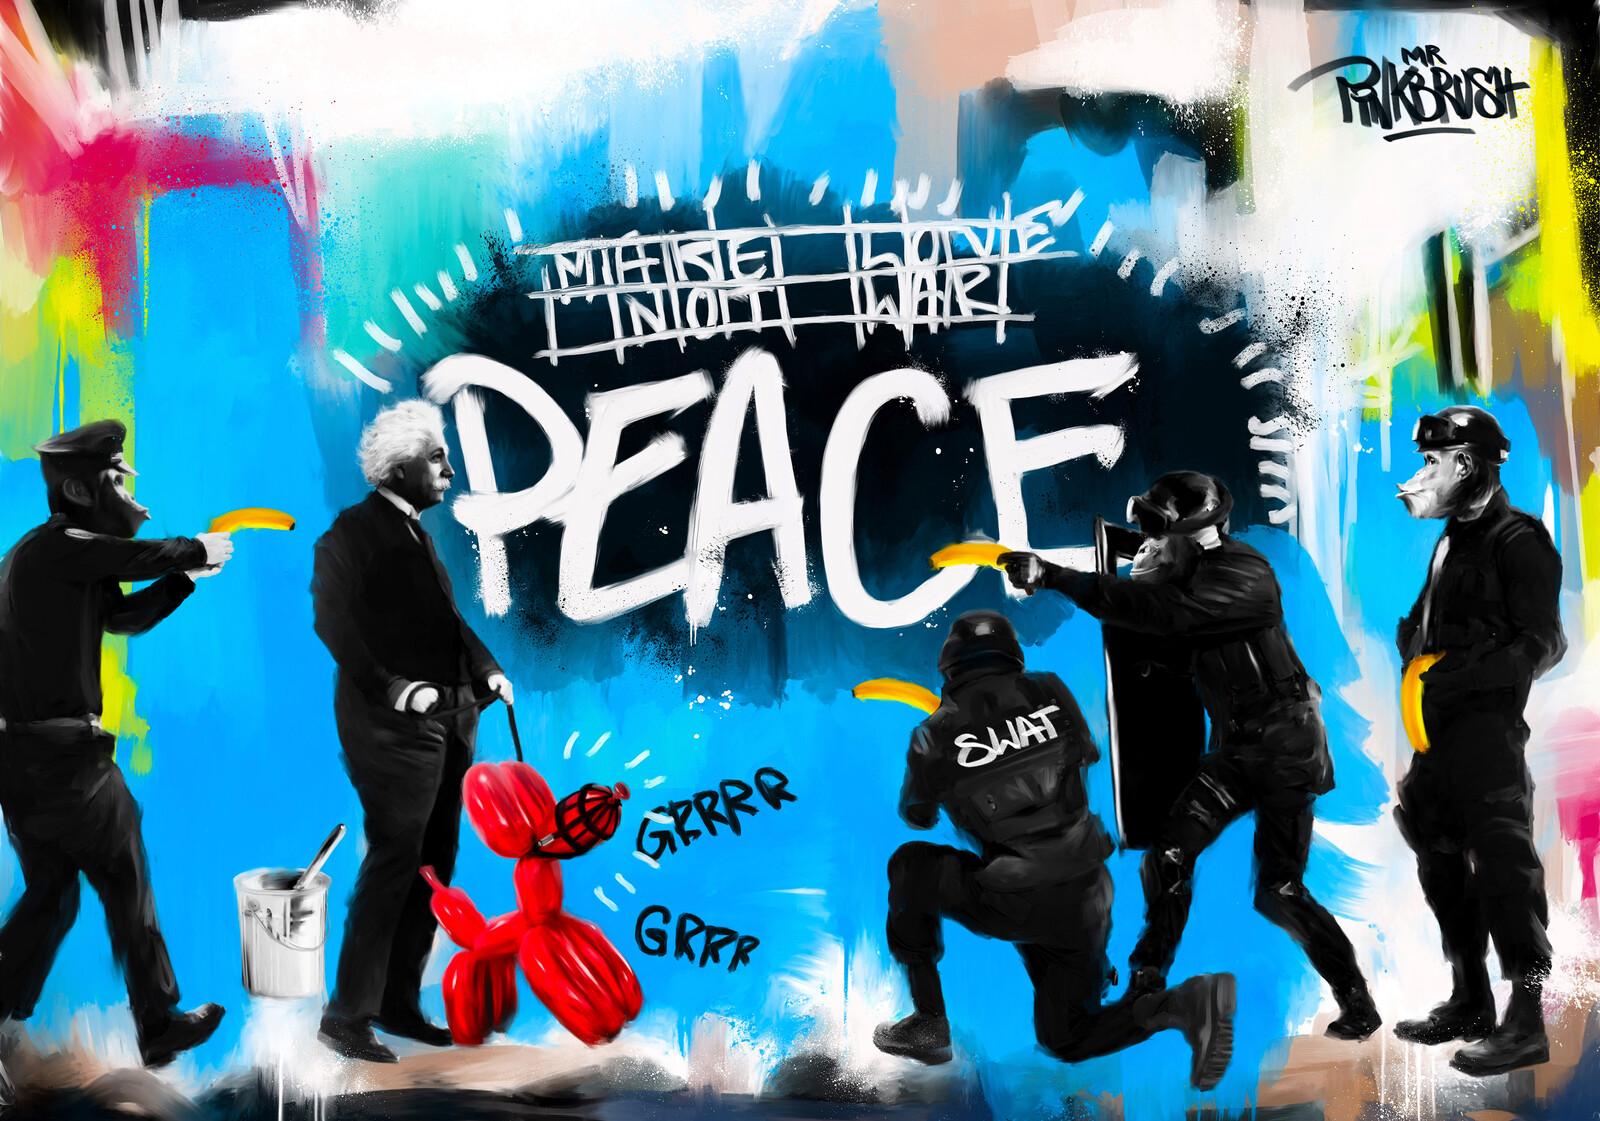 PEACE - Mr. Pinkbrush